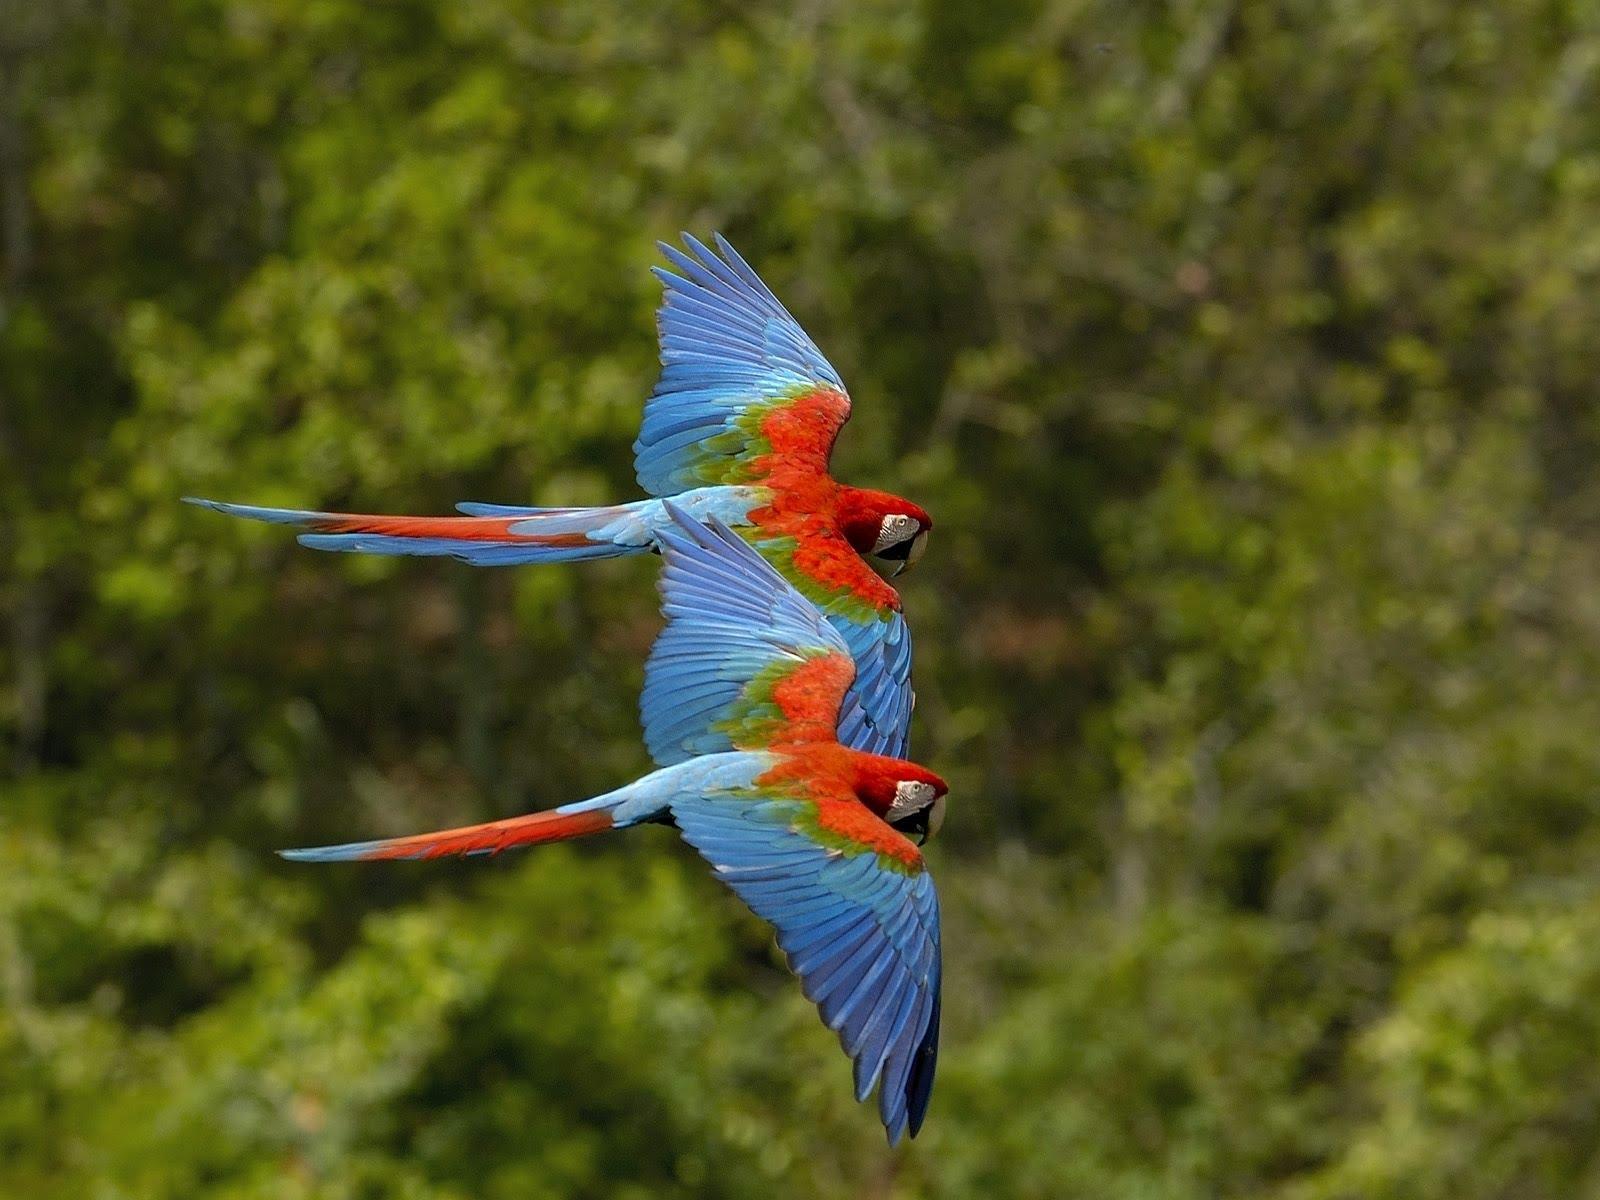 http://1.bp.blogspot.com/_85h0rx9KpUw/TAYUTF5MOWI/AAAAAAAACJM/6ObwQaXd6-s/s1600/009_Baby_Birds_DGN.jpg